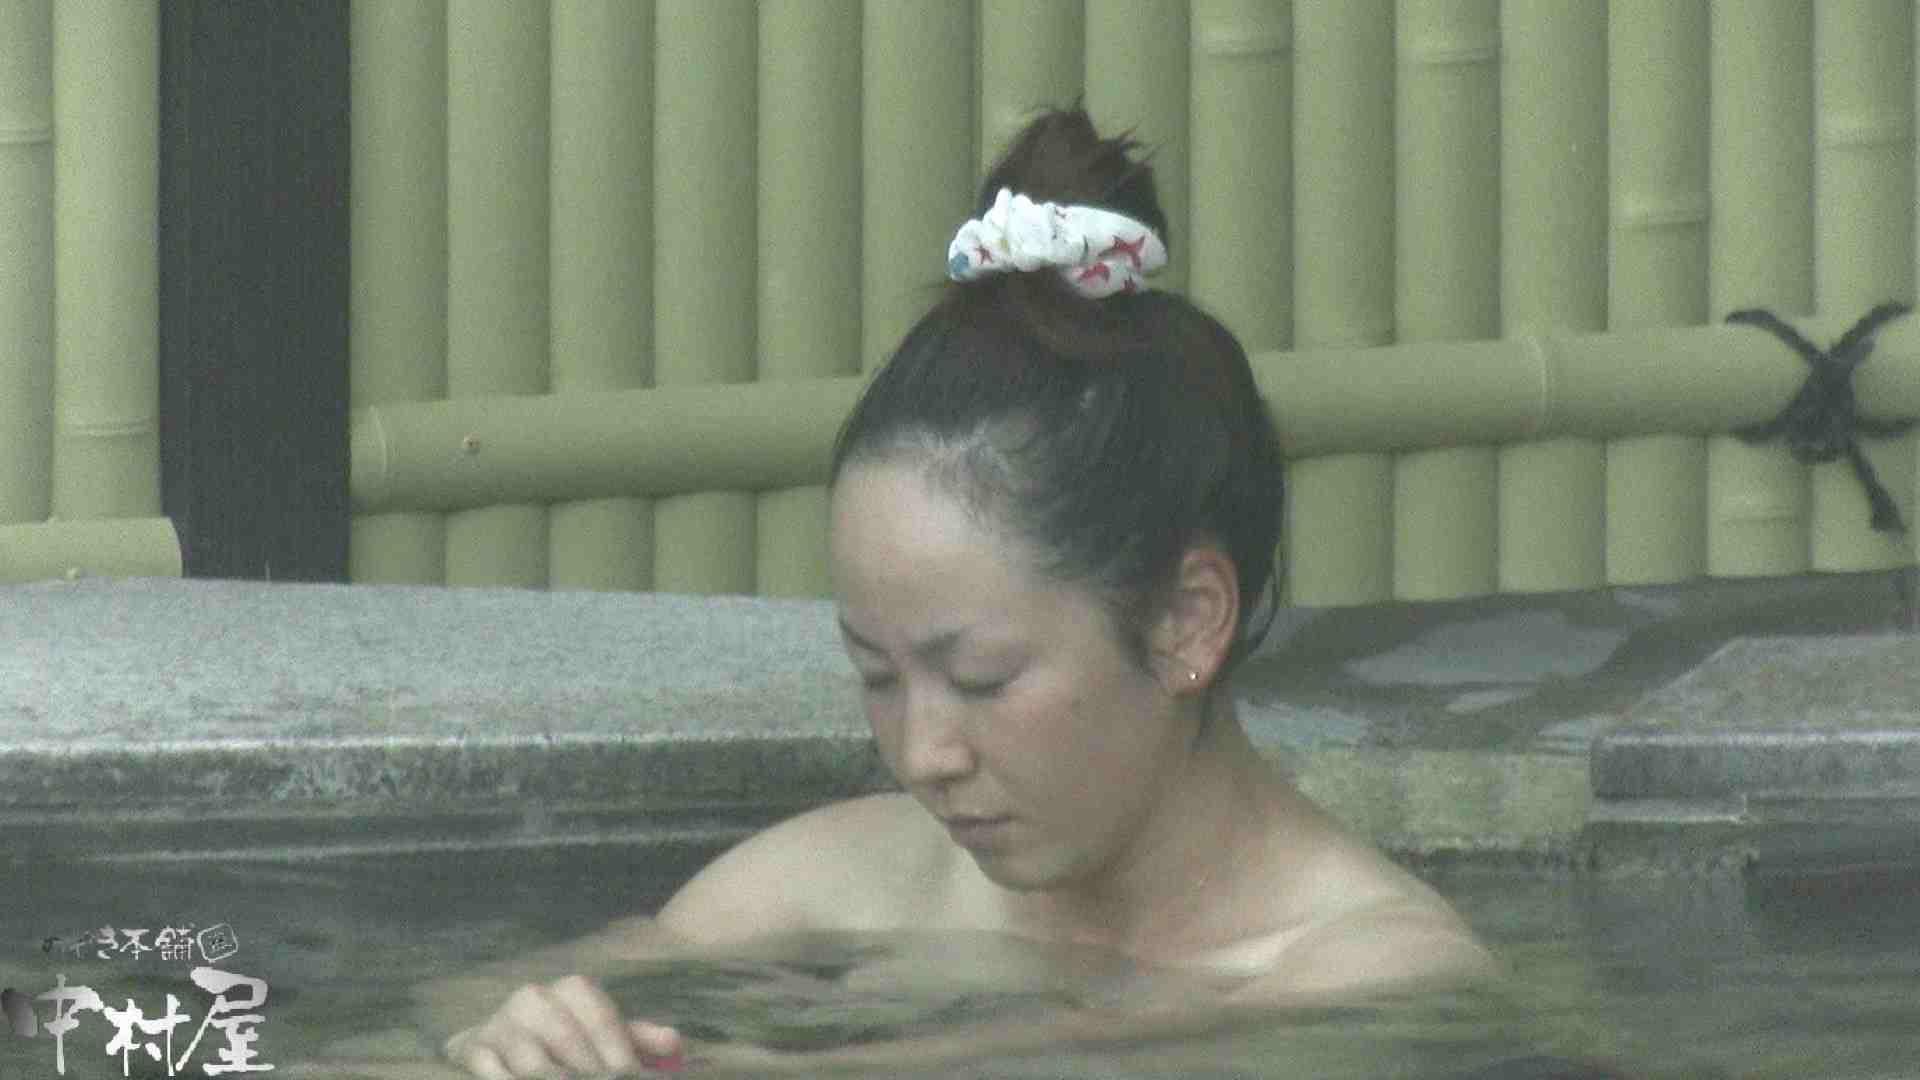 Aquaな露天風呂Vol.911 0   0  88連発 71